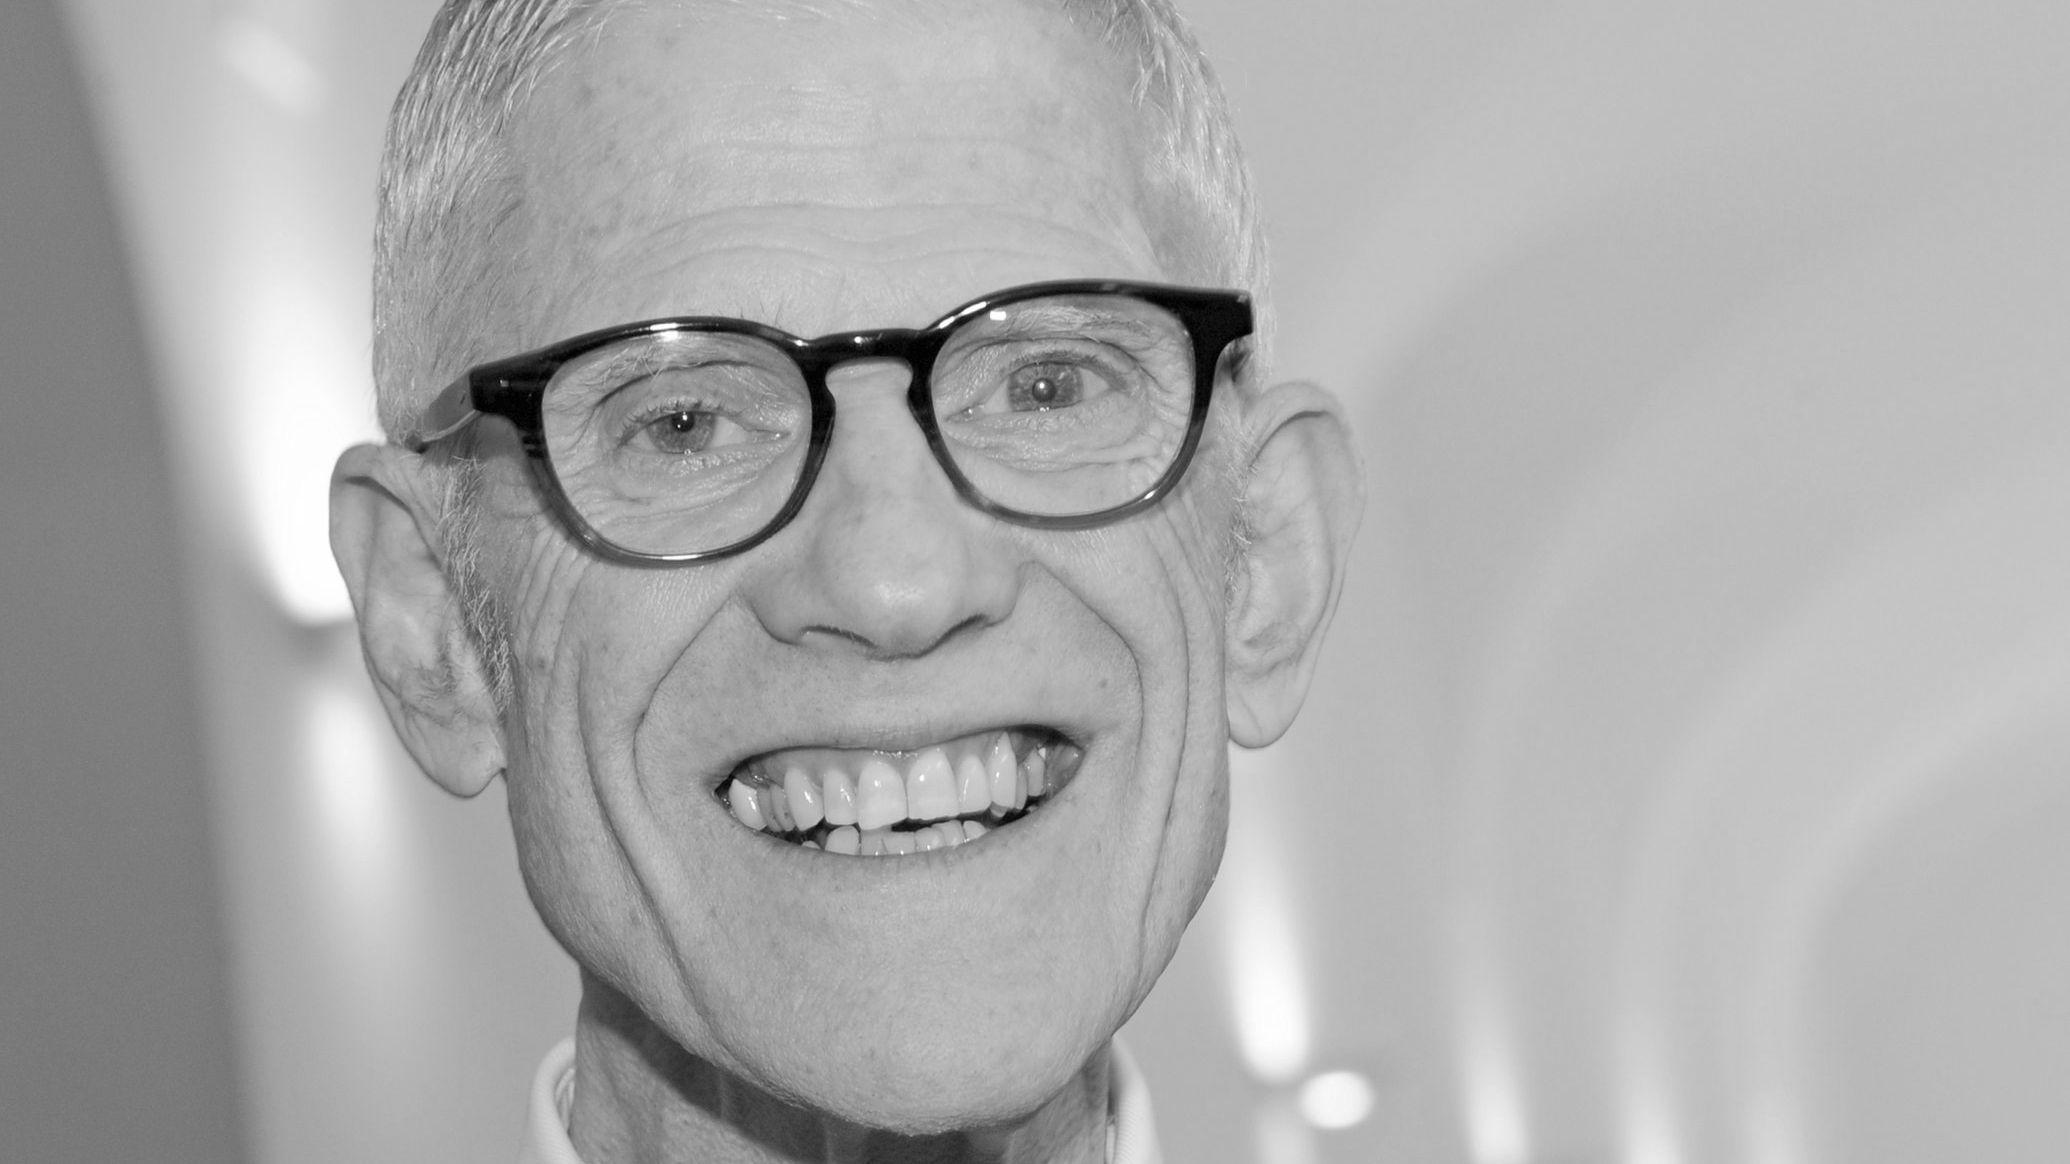 Opernmanager Peter Jonas mit 73 Jahren gestorben